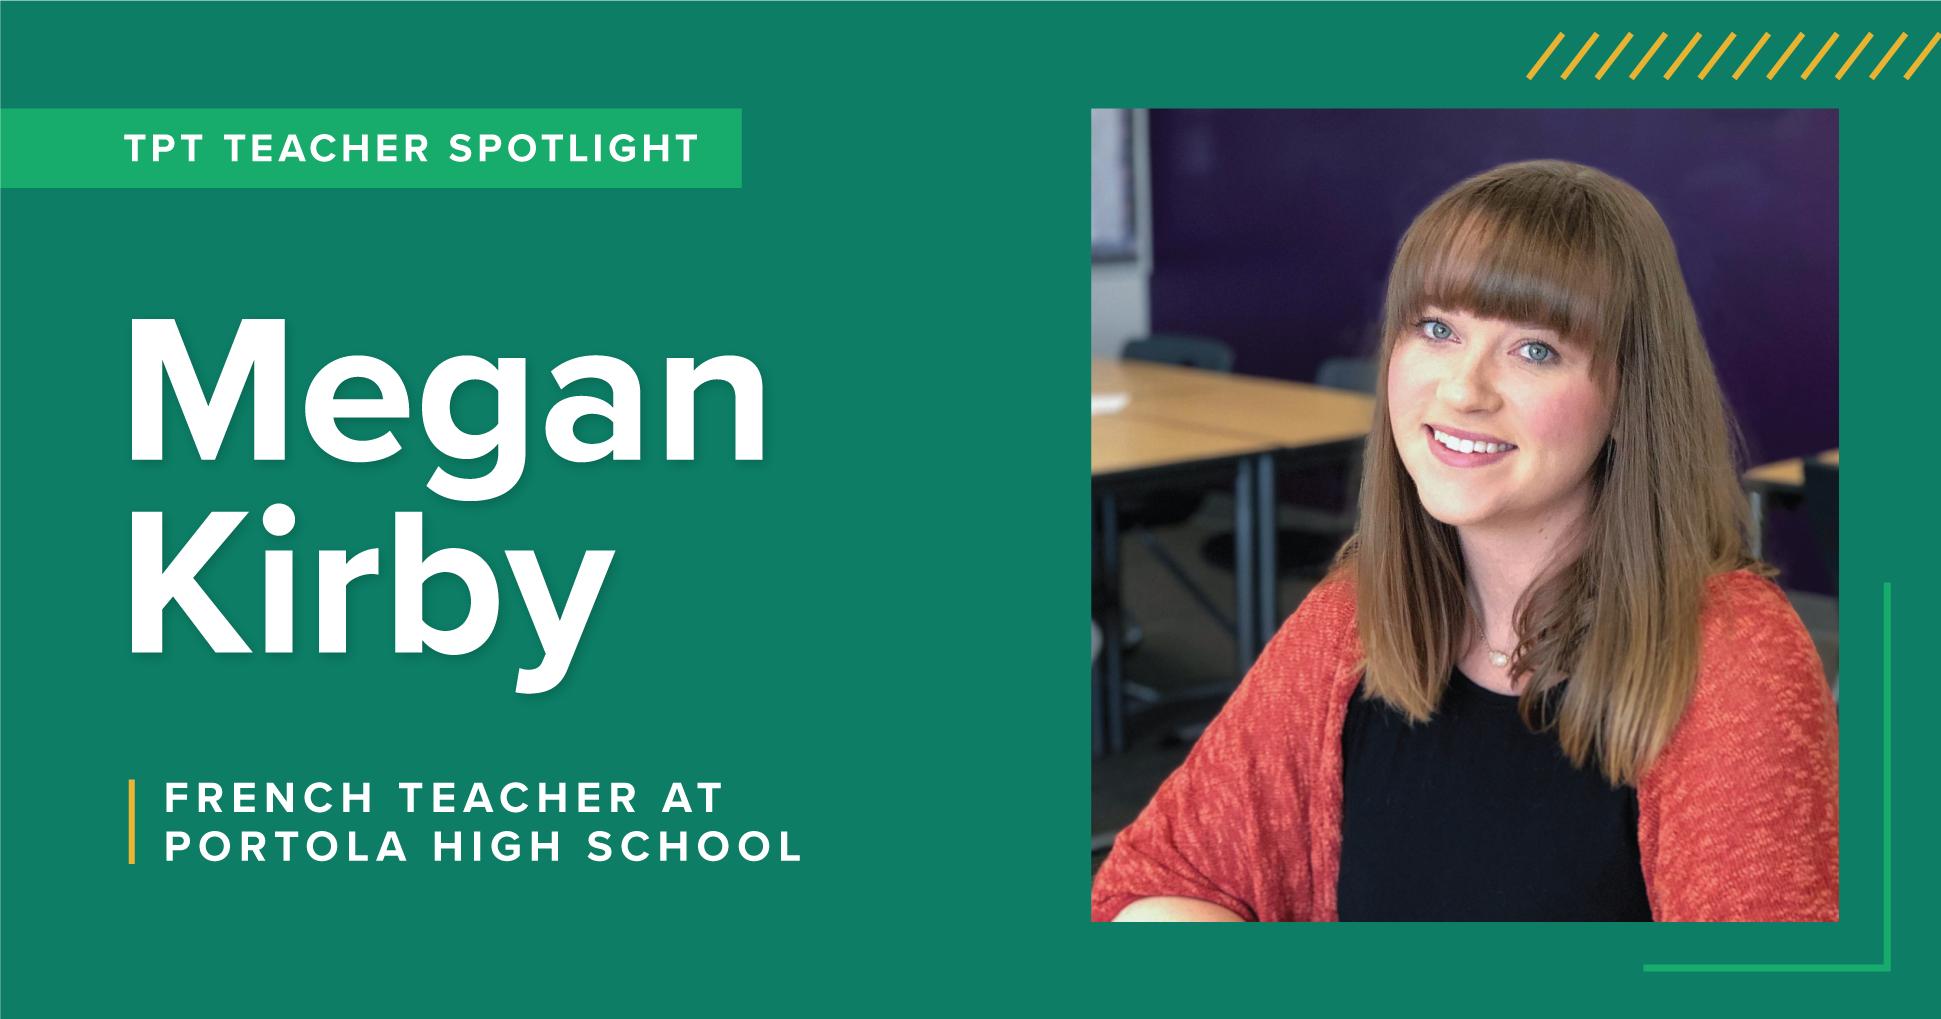 A TpT Teacher Spotlight on Megan Kirby, a French teacher at Portola High School.